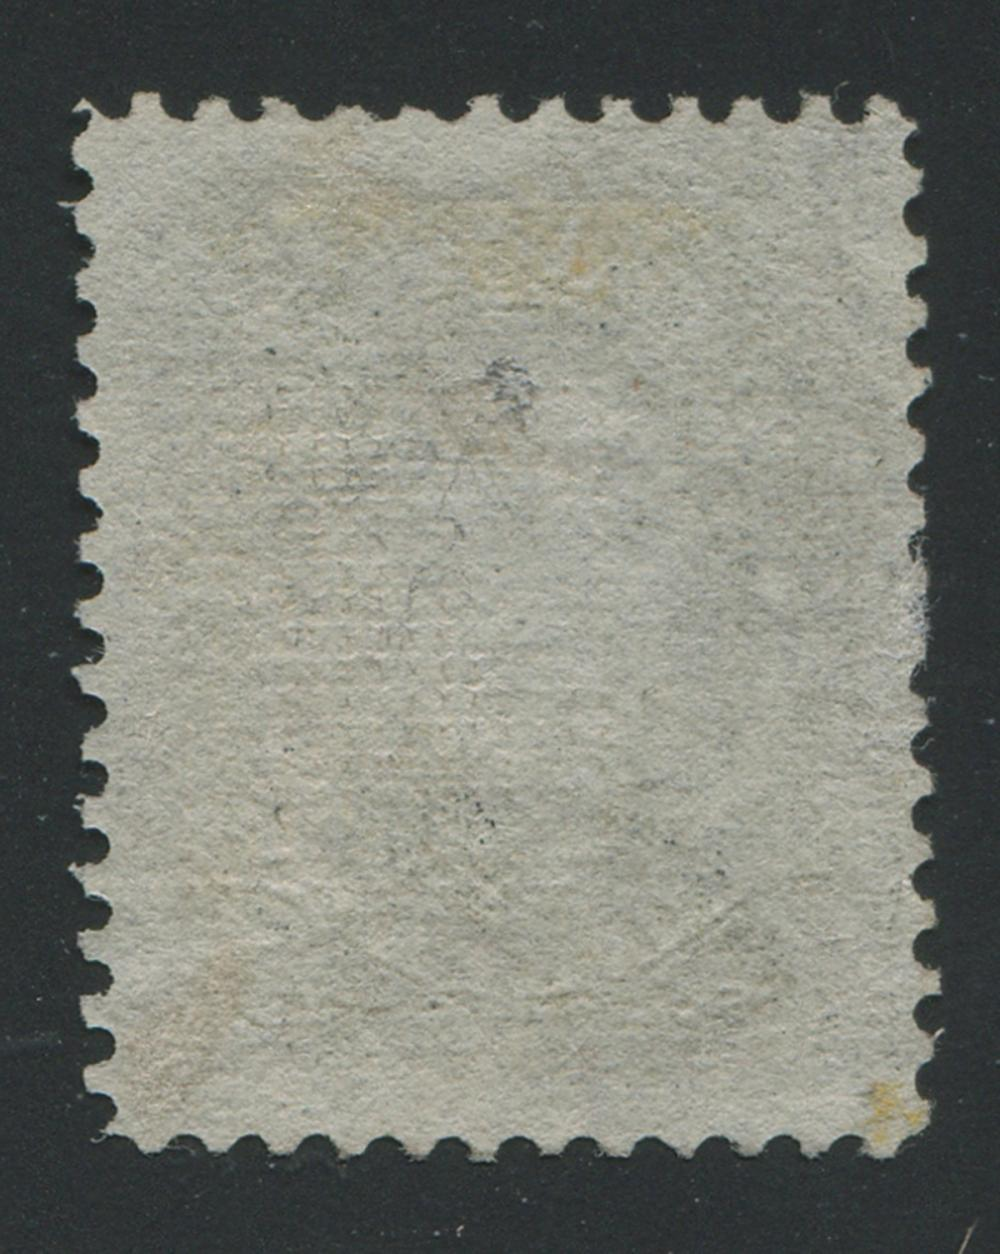 USA 1861 - 1866 #90 12 Cent Black